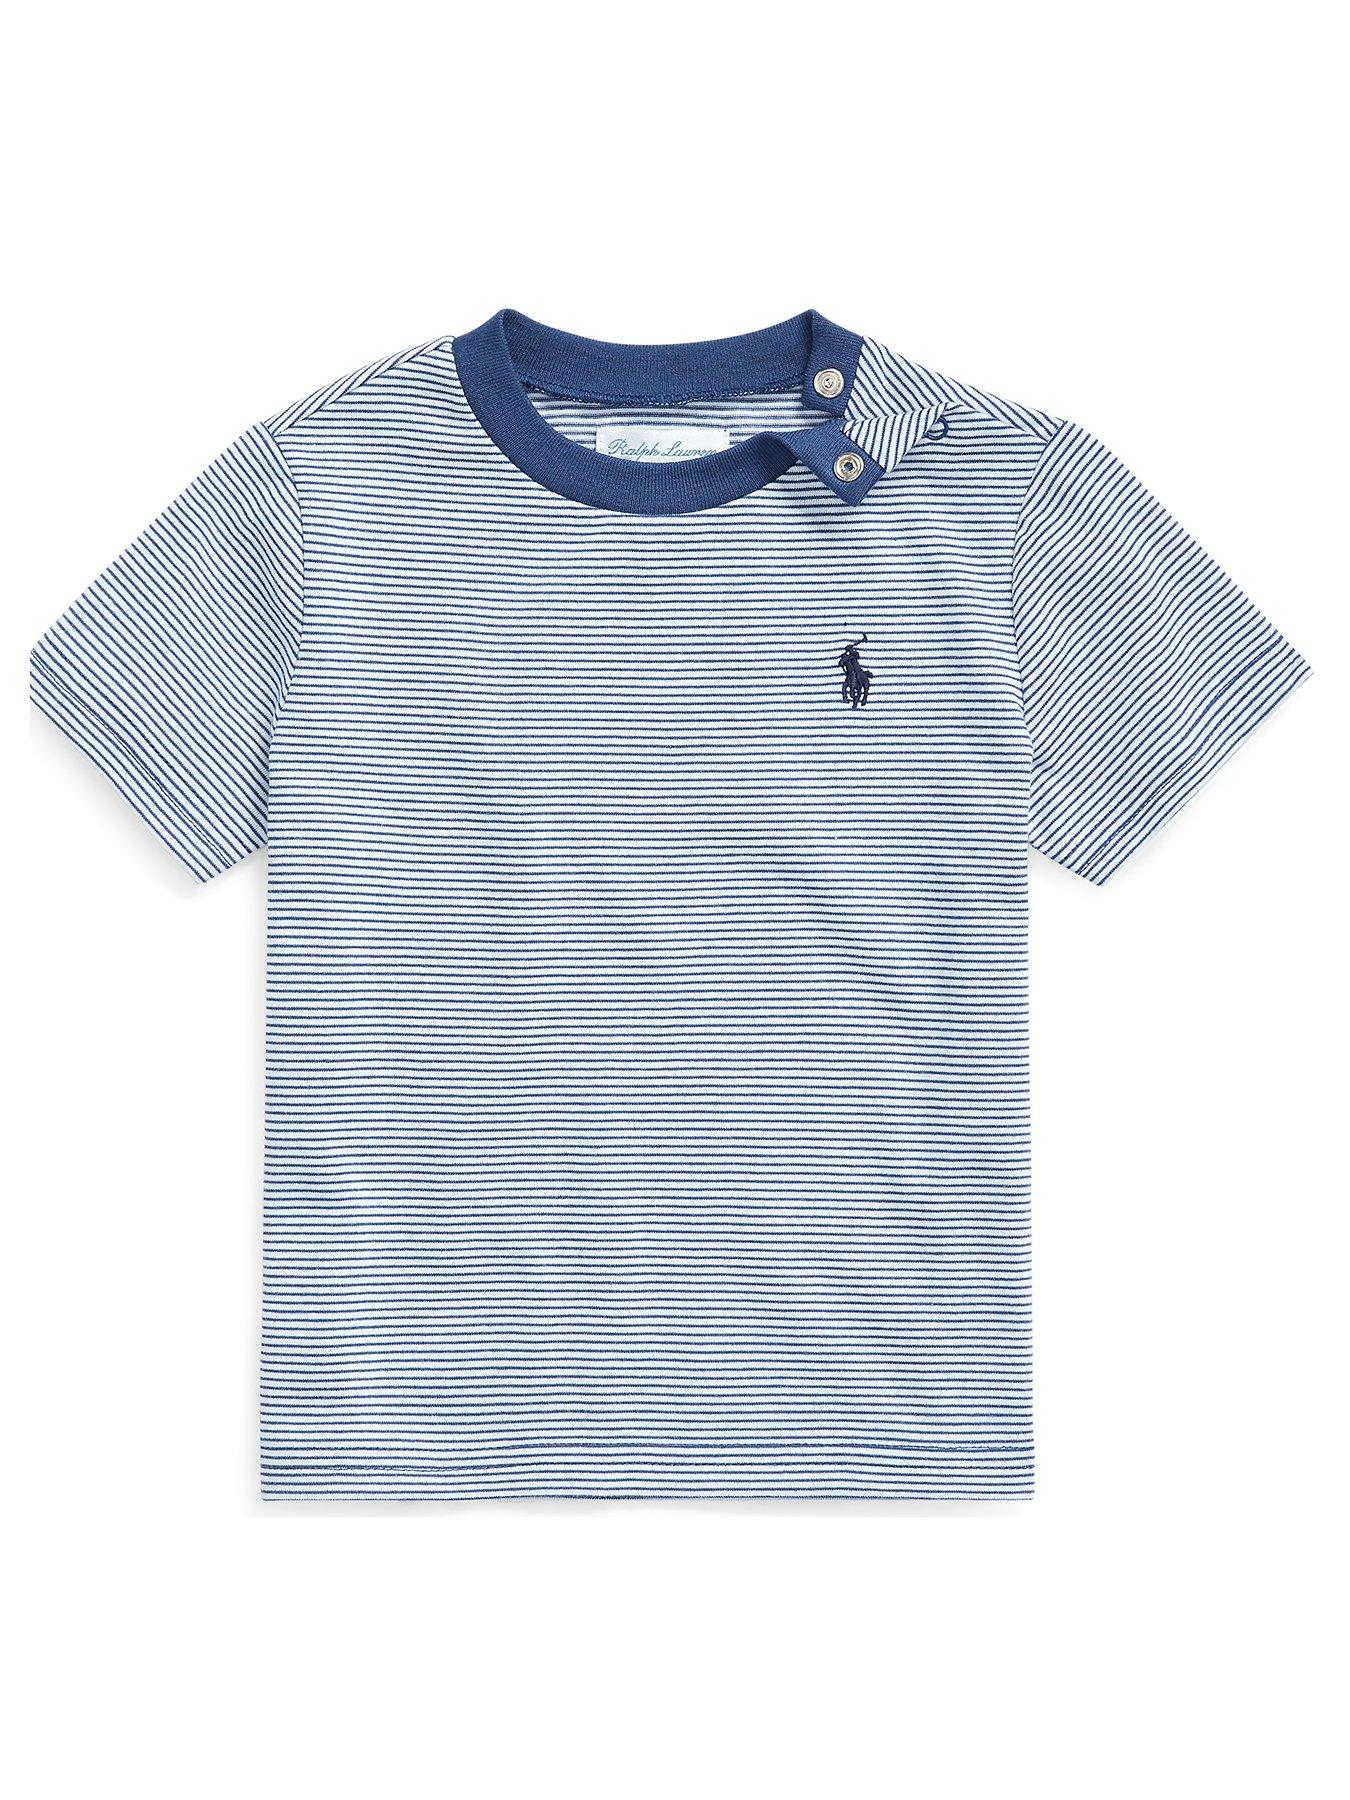 UlanLi Infant Tee Mothers Day Name Baby Organic Short Sleeve T-Shirt White